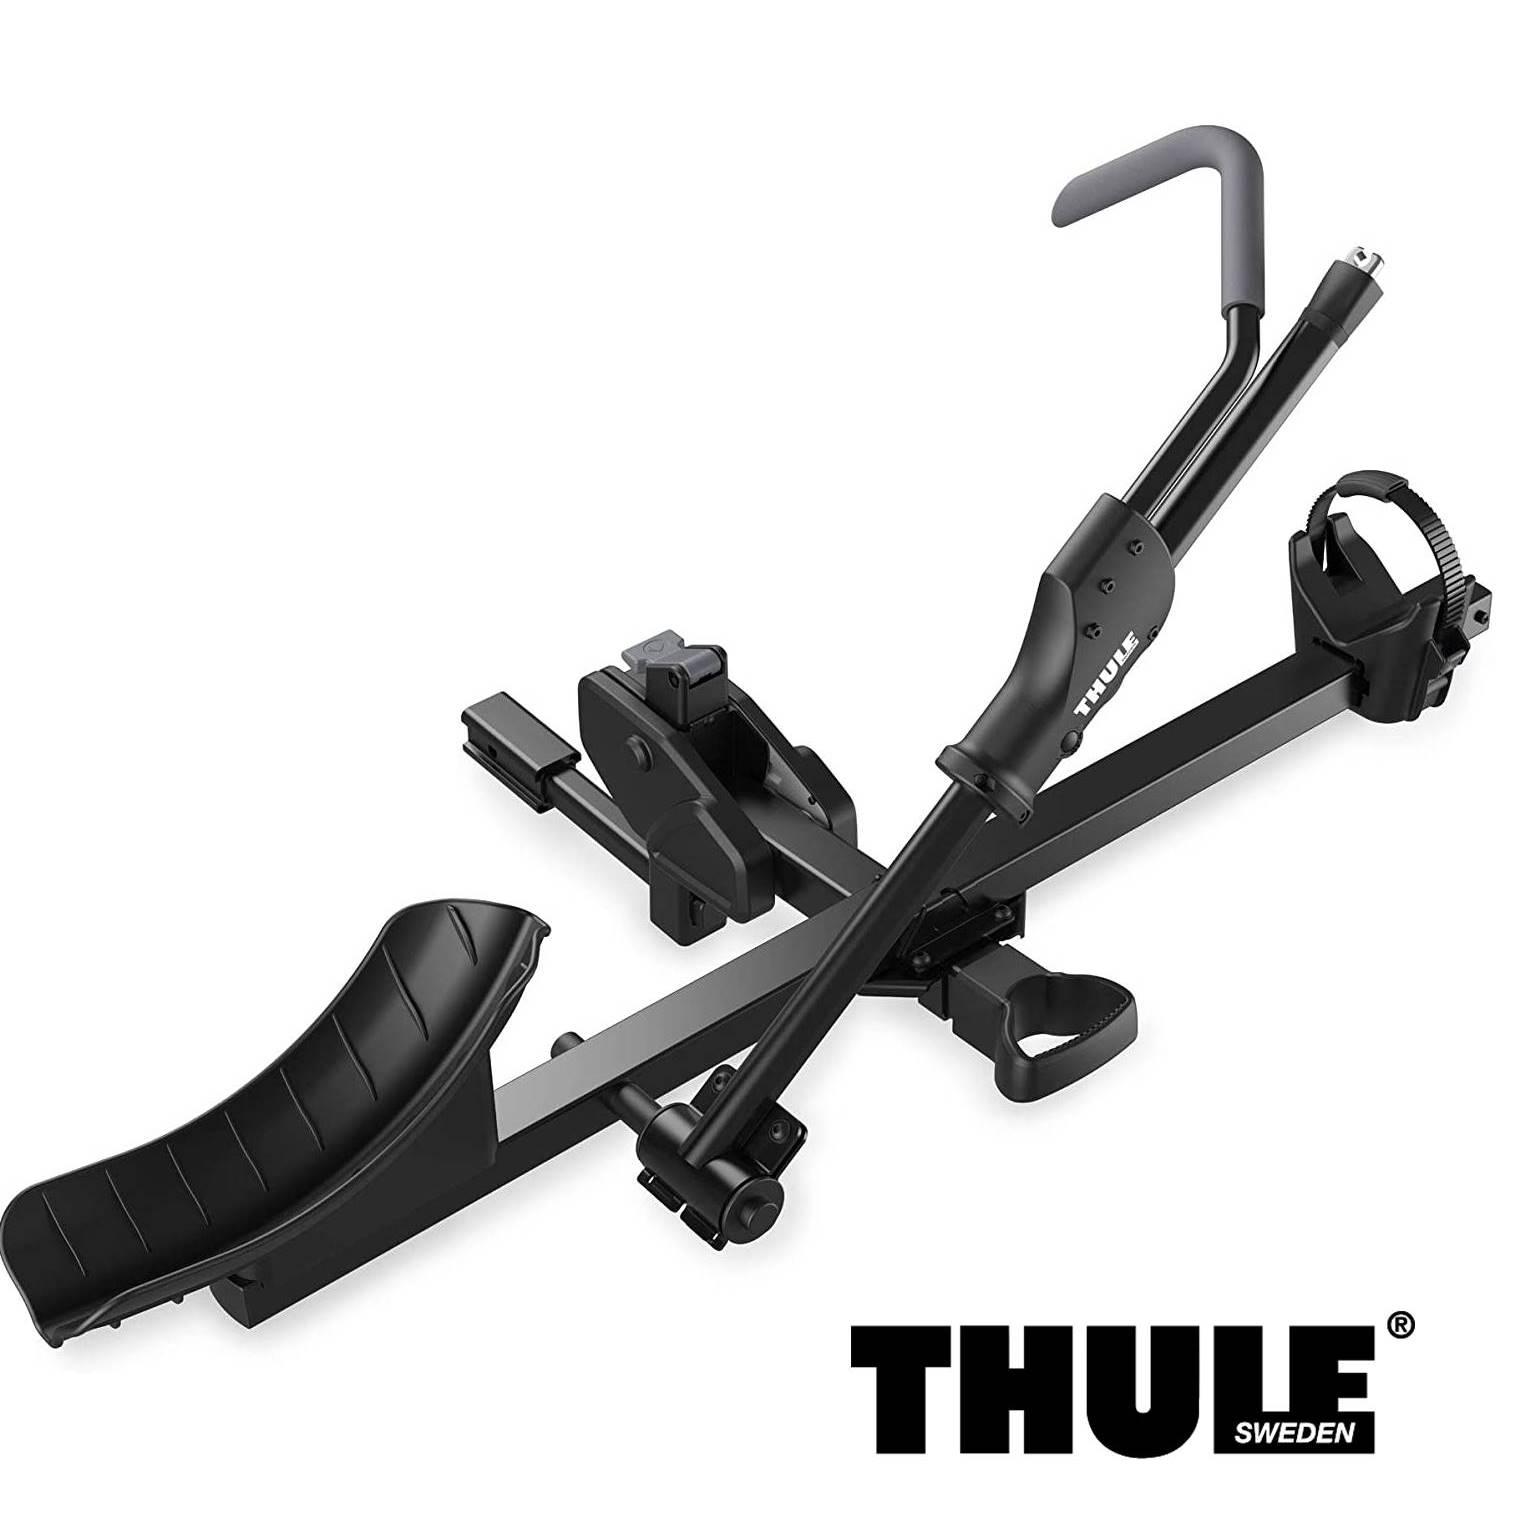 Suporte Engate Thule T1 - 1 Bicicleta